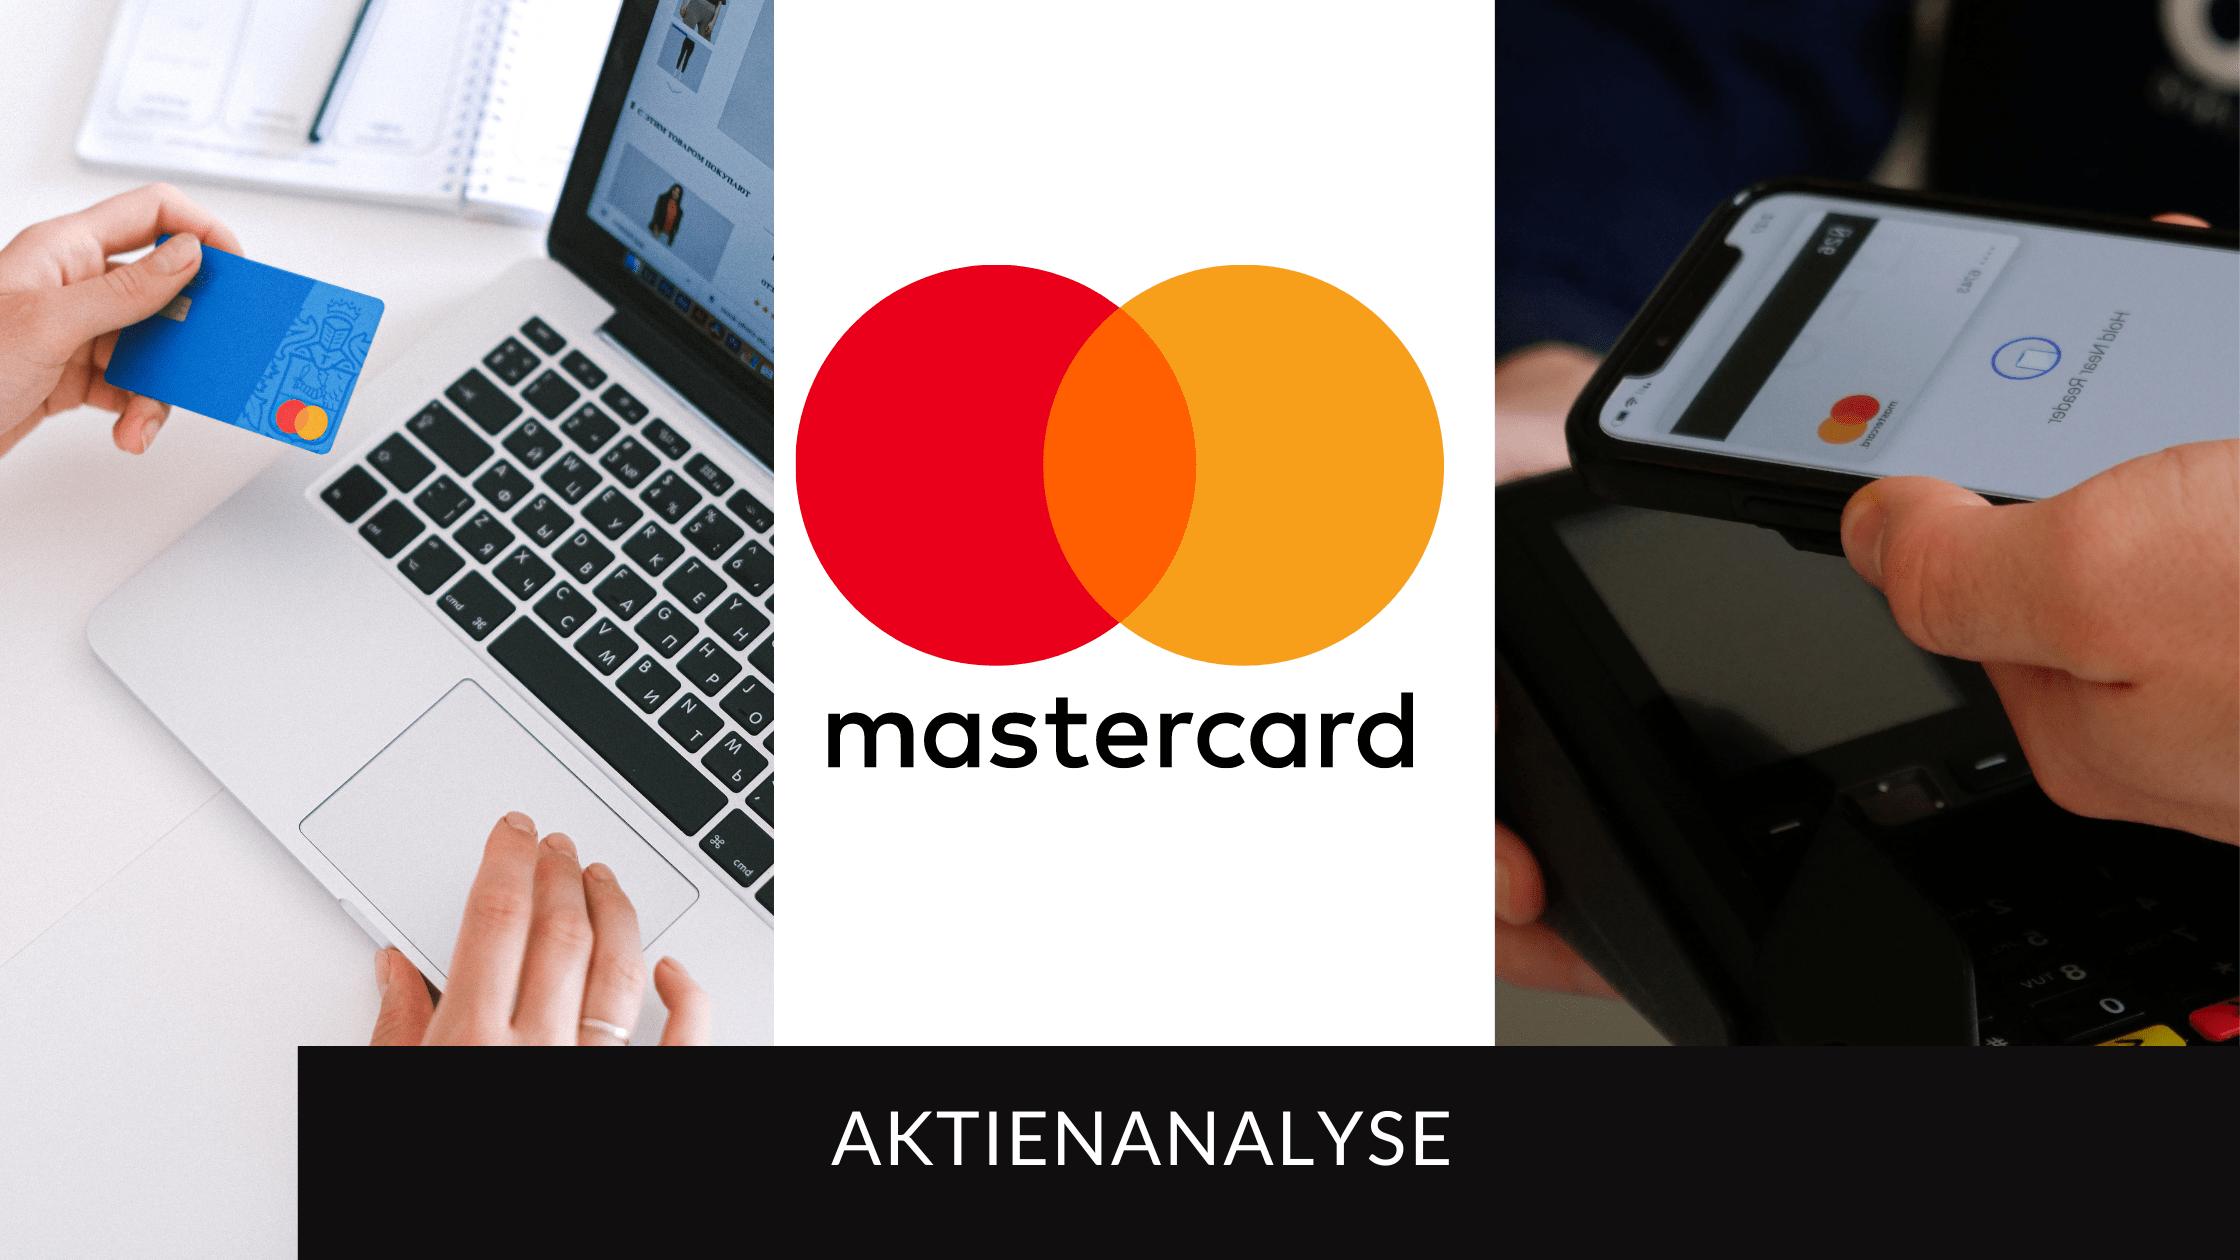 Mastercard Aktienanalyse